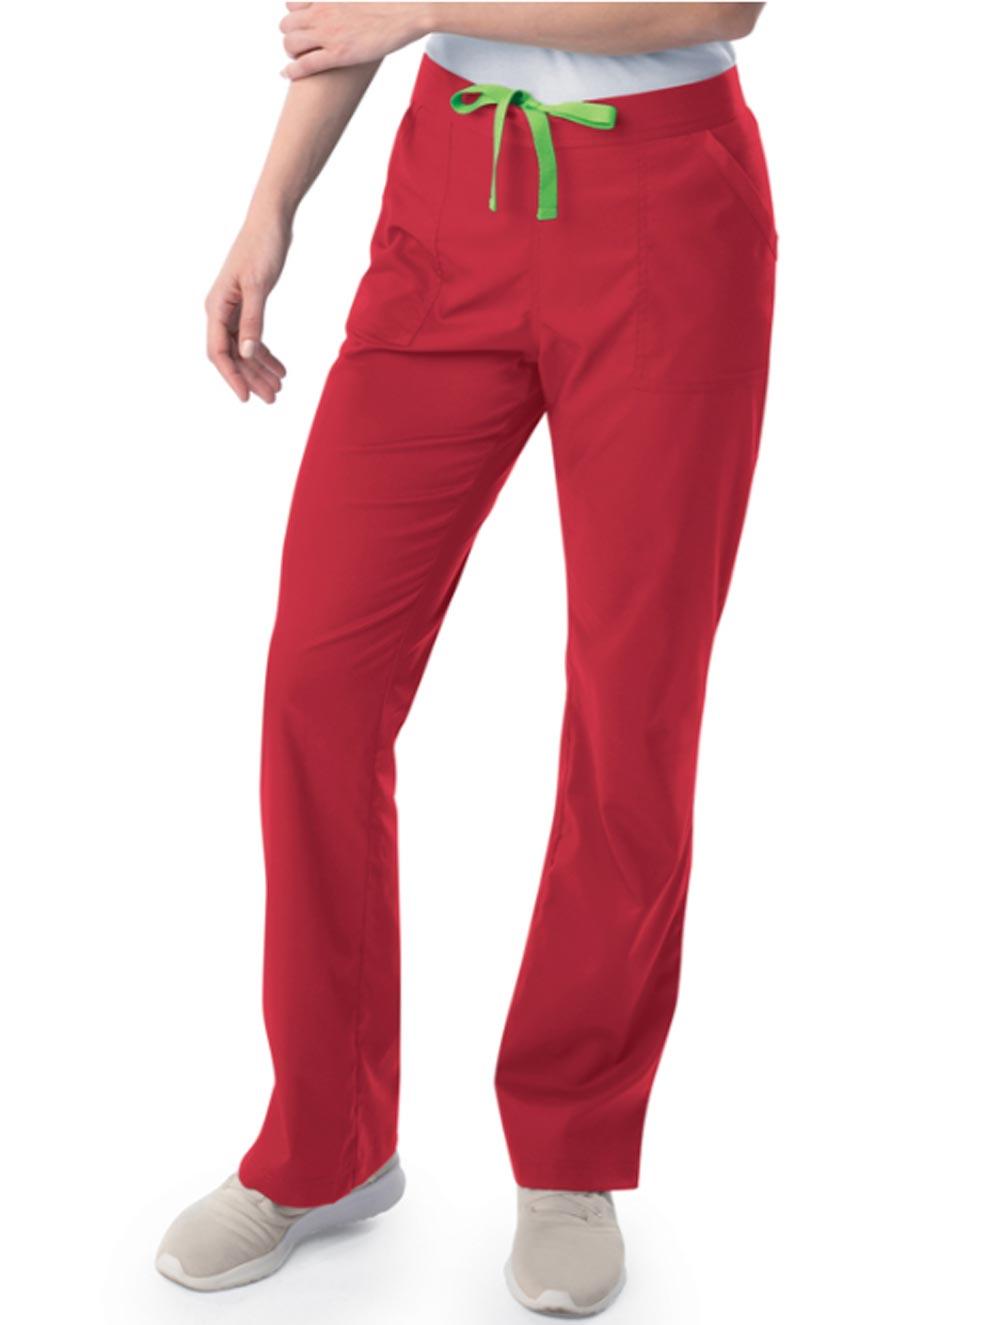 Women's Modern 1/2 & 1/2 Straight Leg Pants